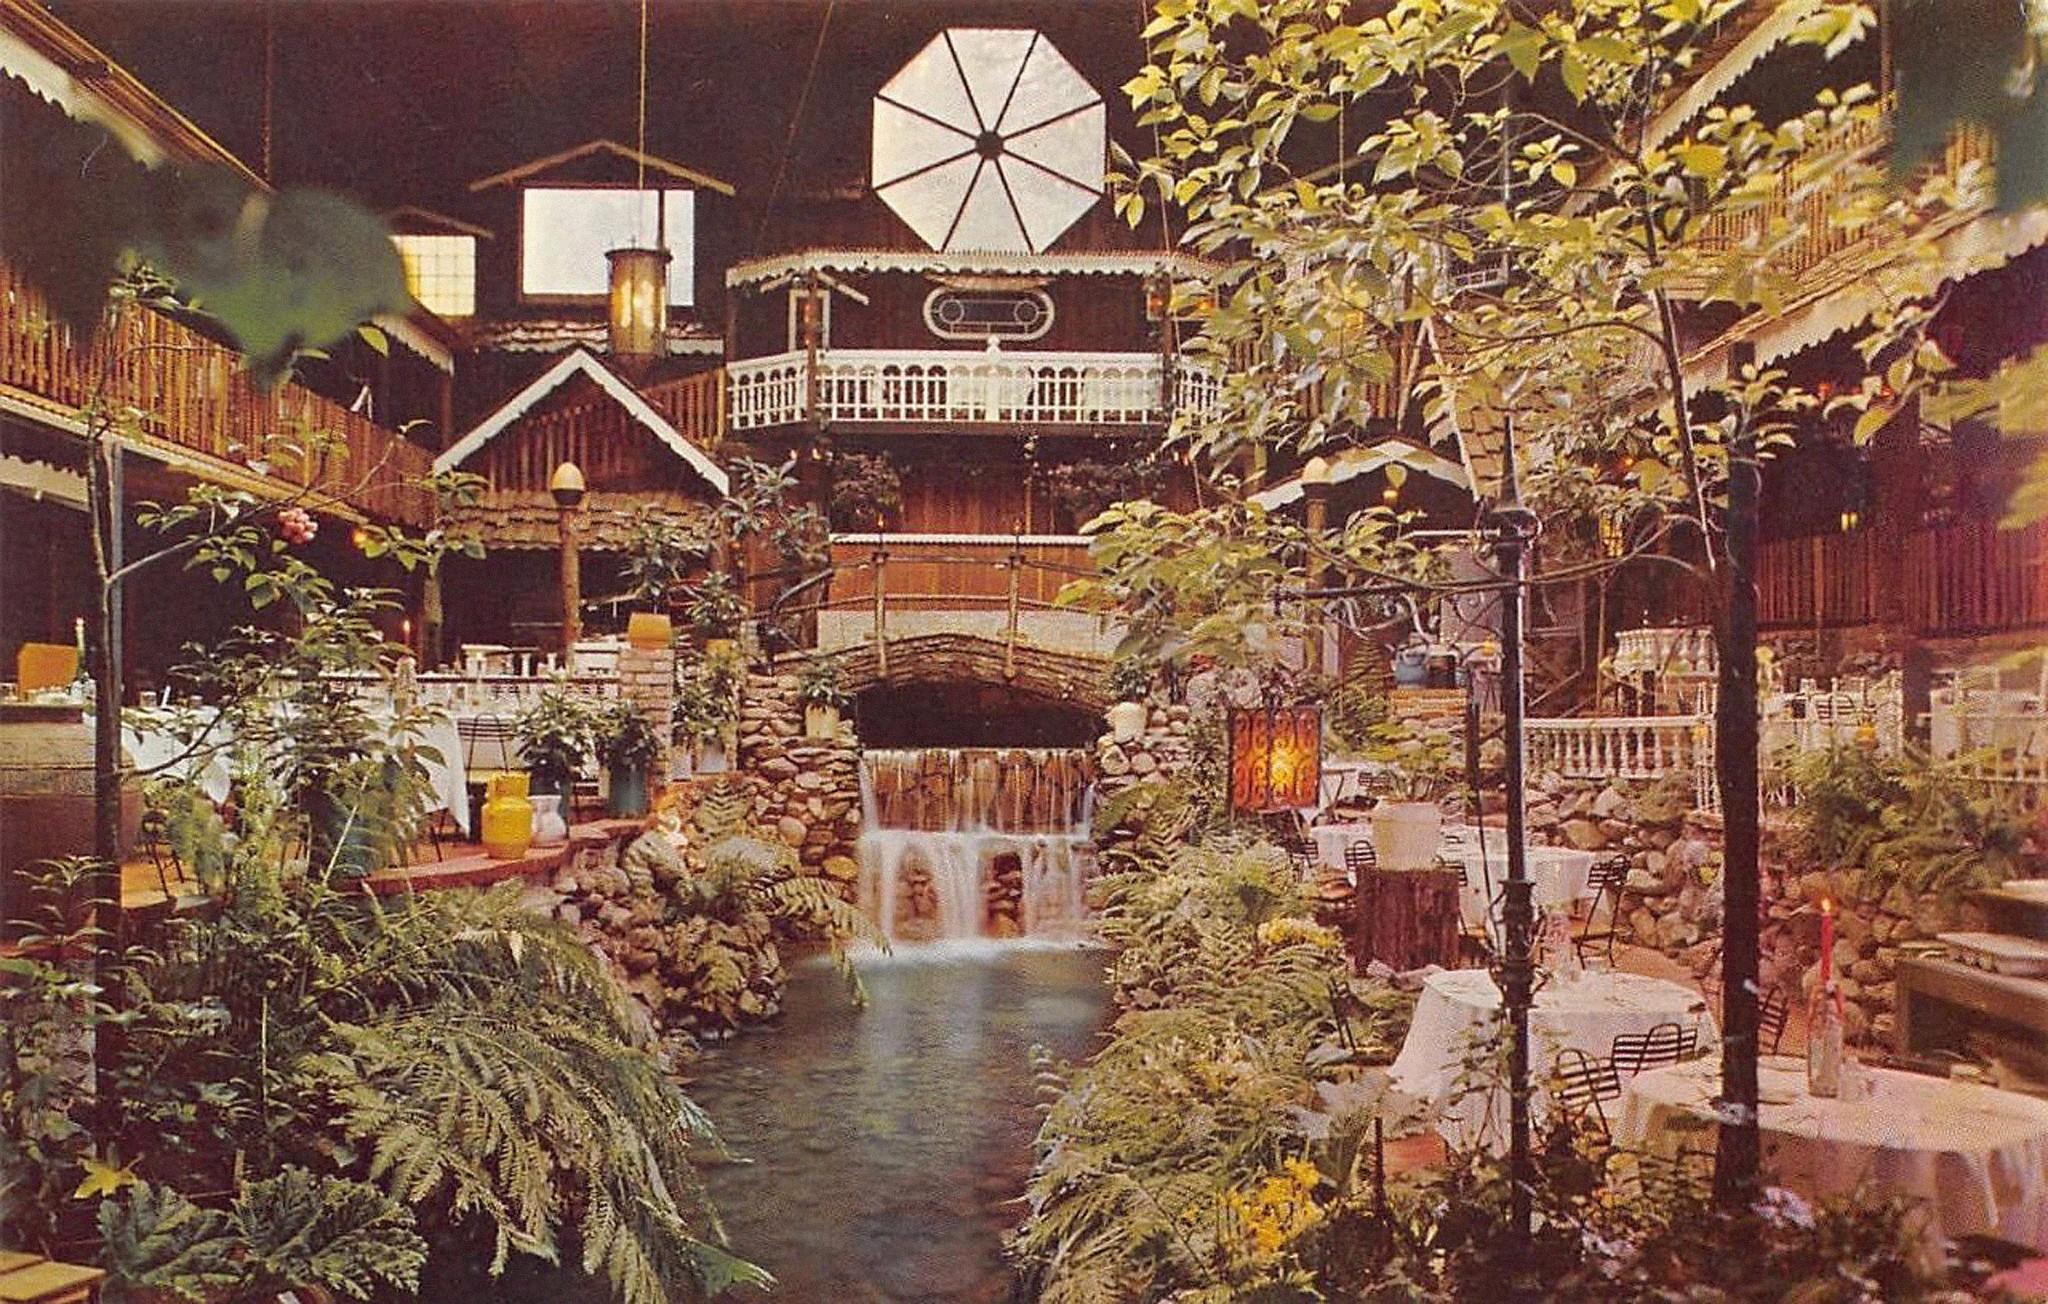 Swimming Pool Movie Remember When The Brookdale Lodge Santa Cruz Waves